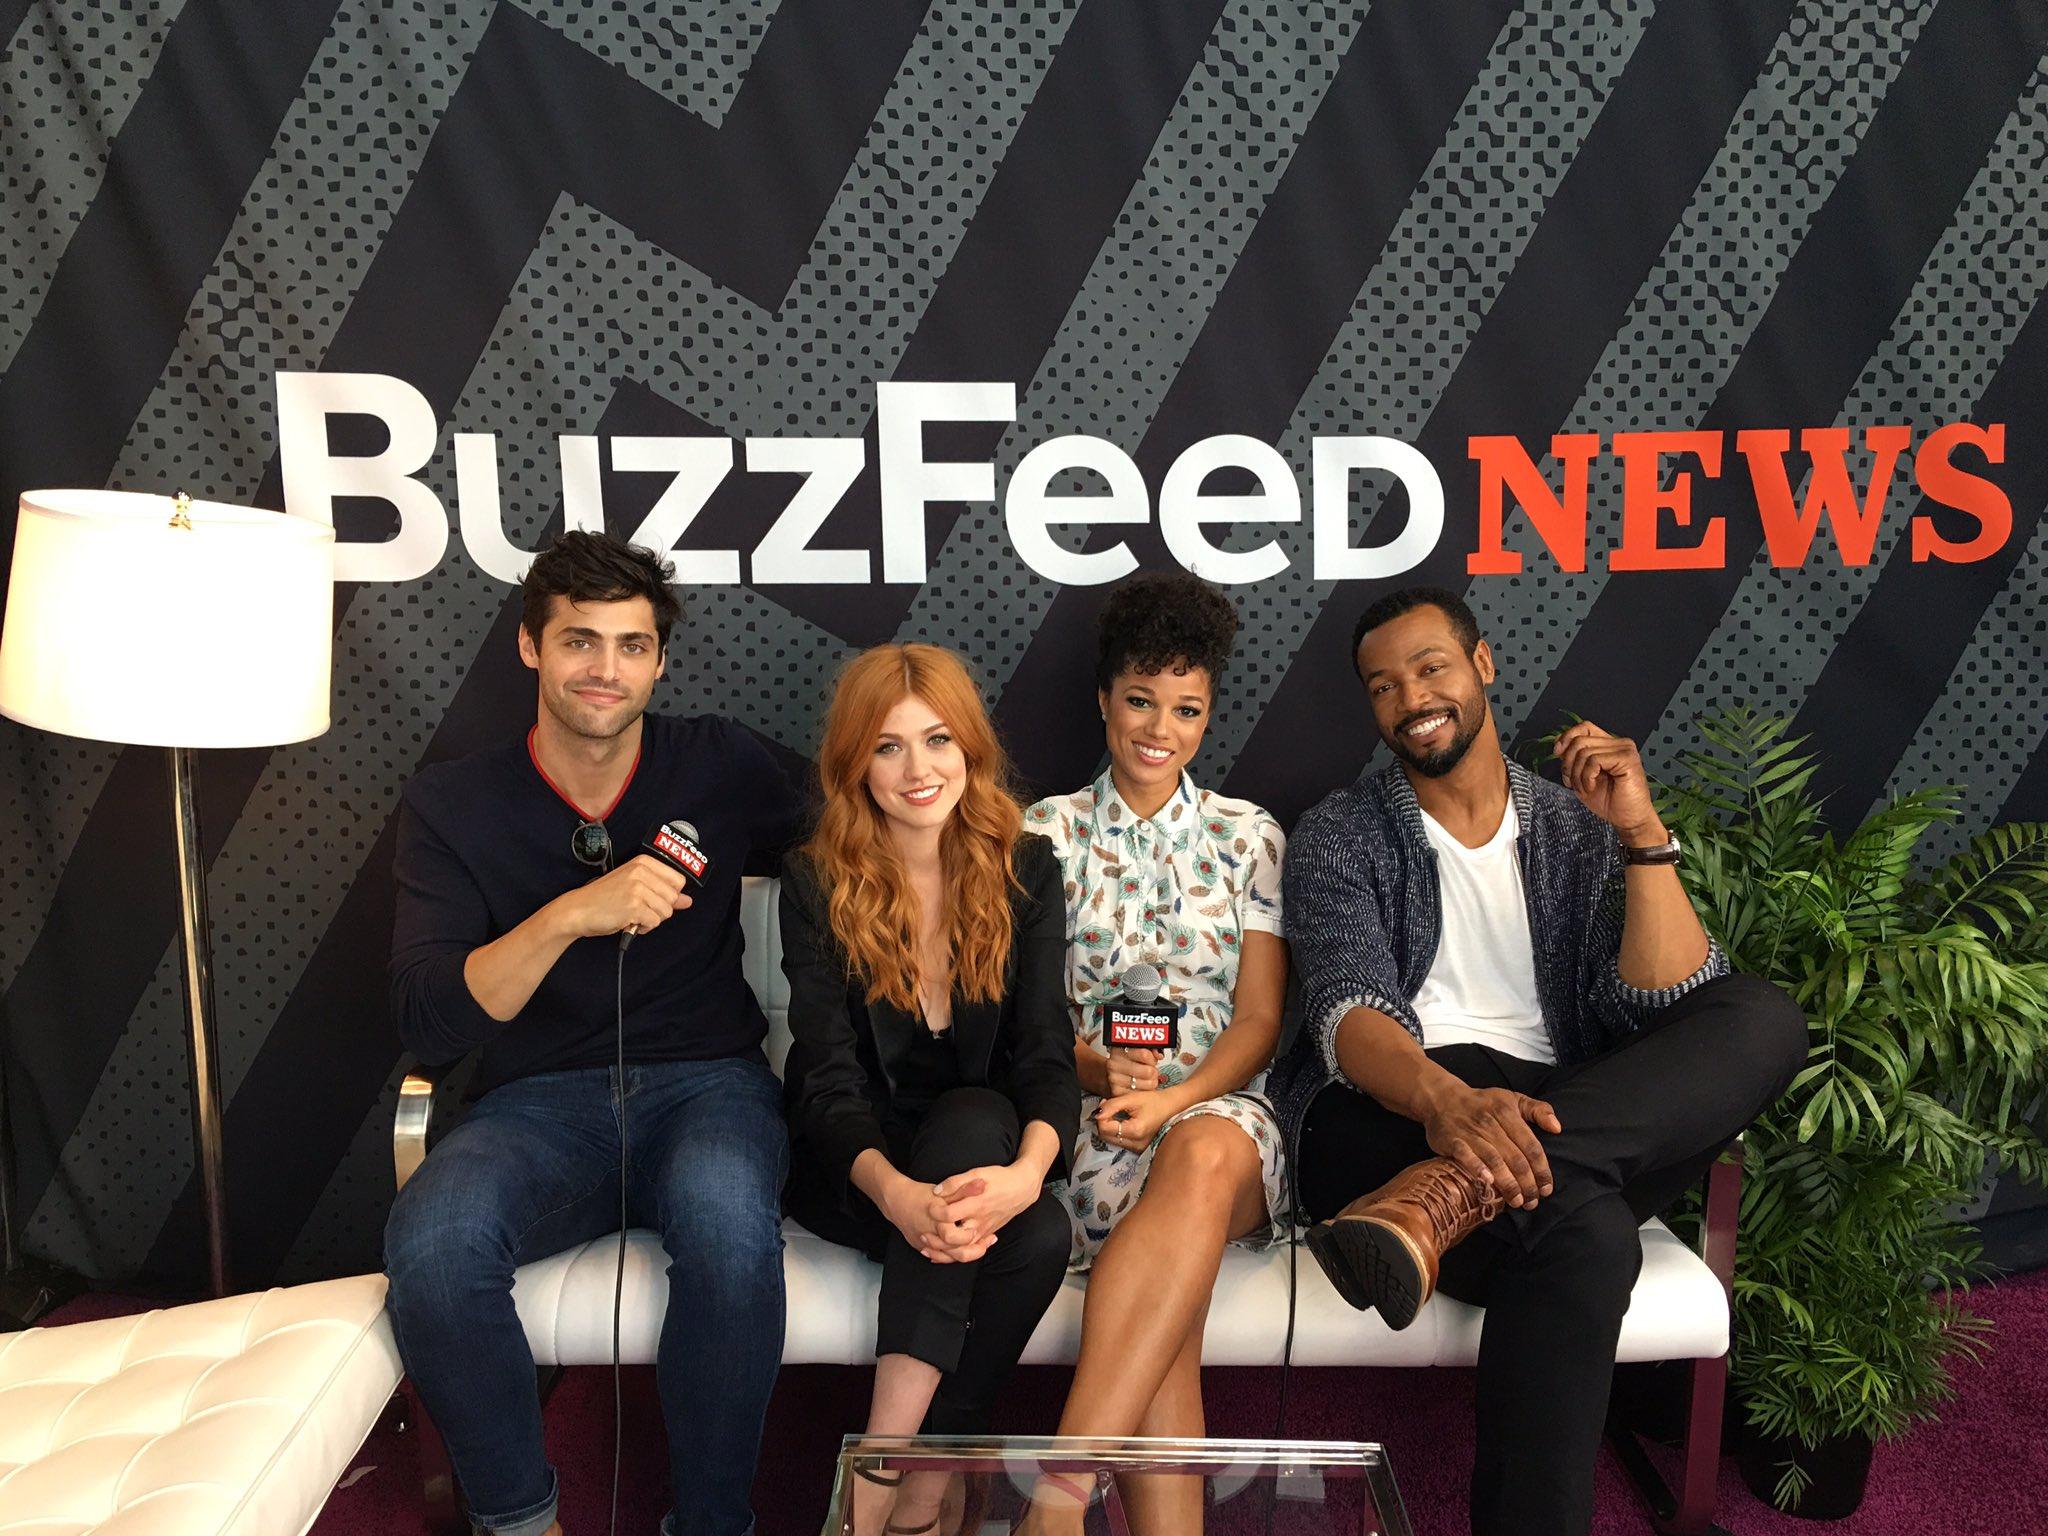 #Shadowhunters crew at @BuzzfeedNews. Let's go. �� #ShadowhuntersNYCC https://t.co/Pqm7YfOFpm